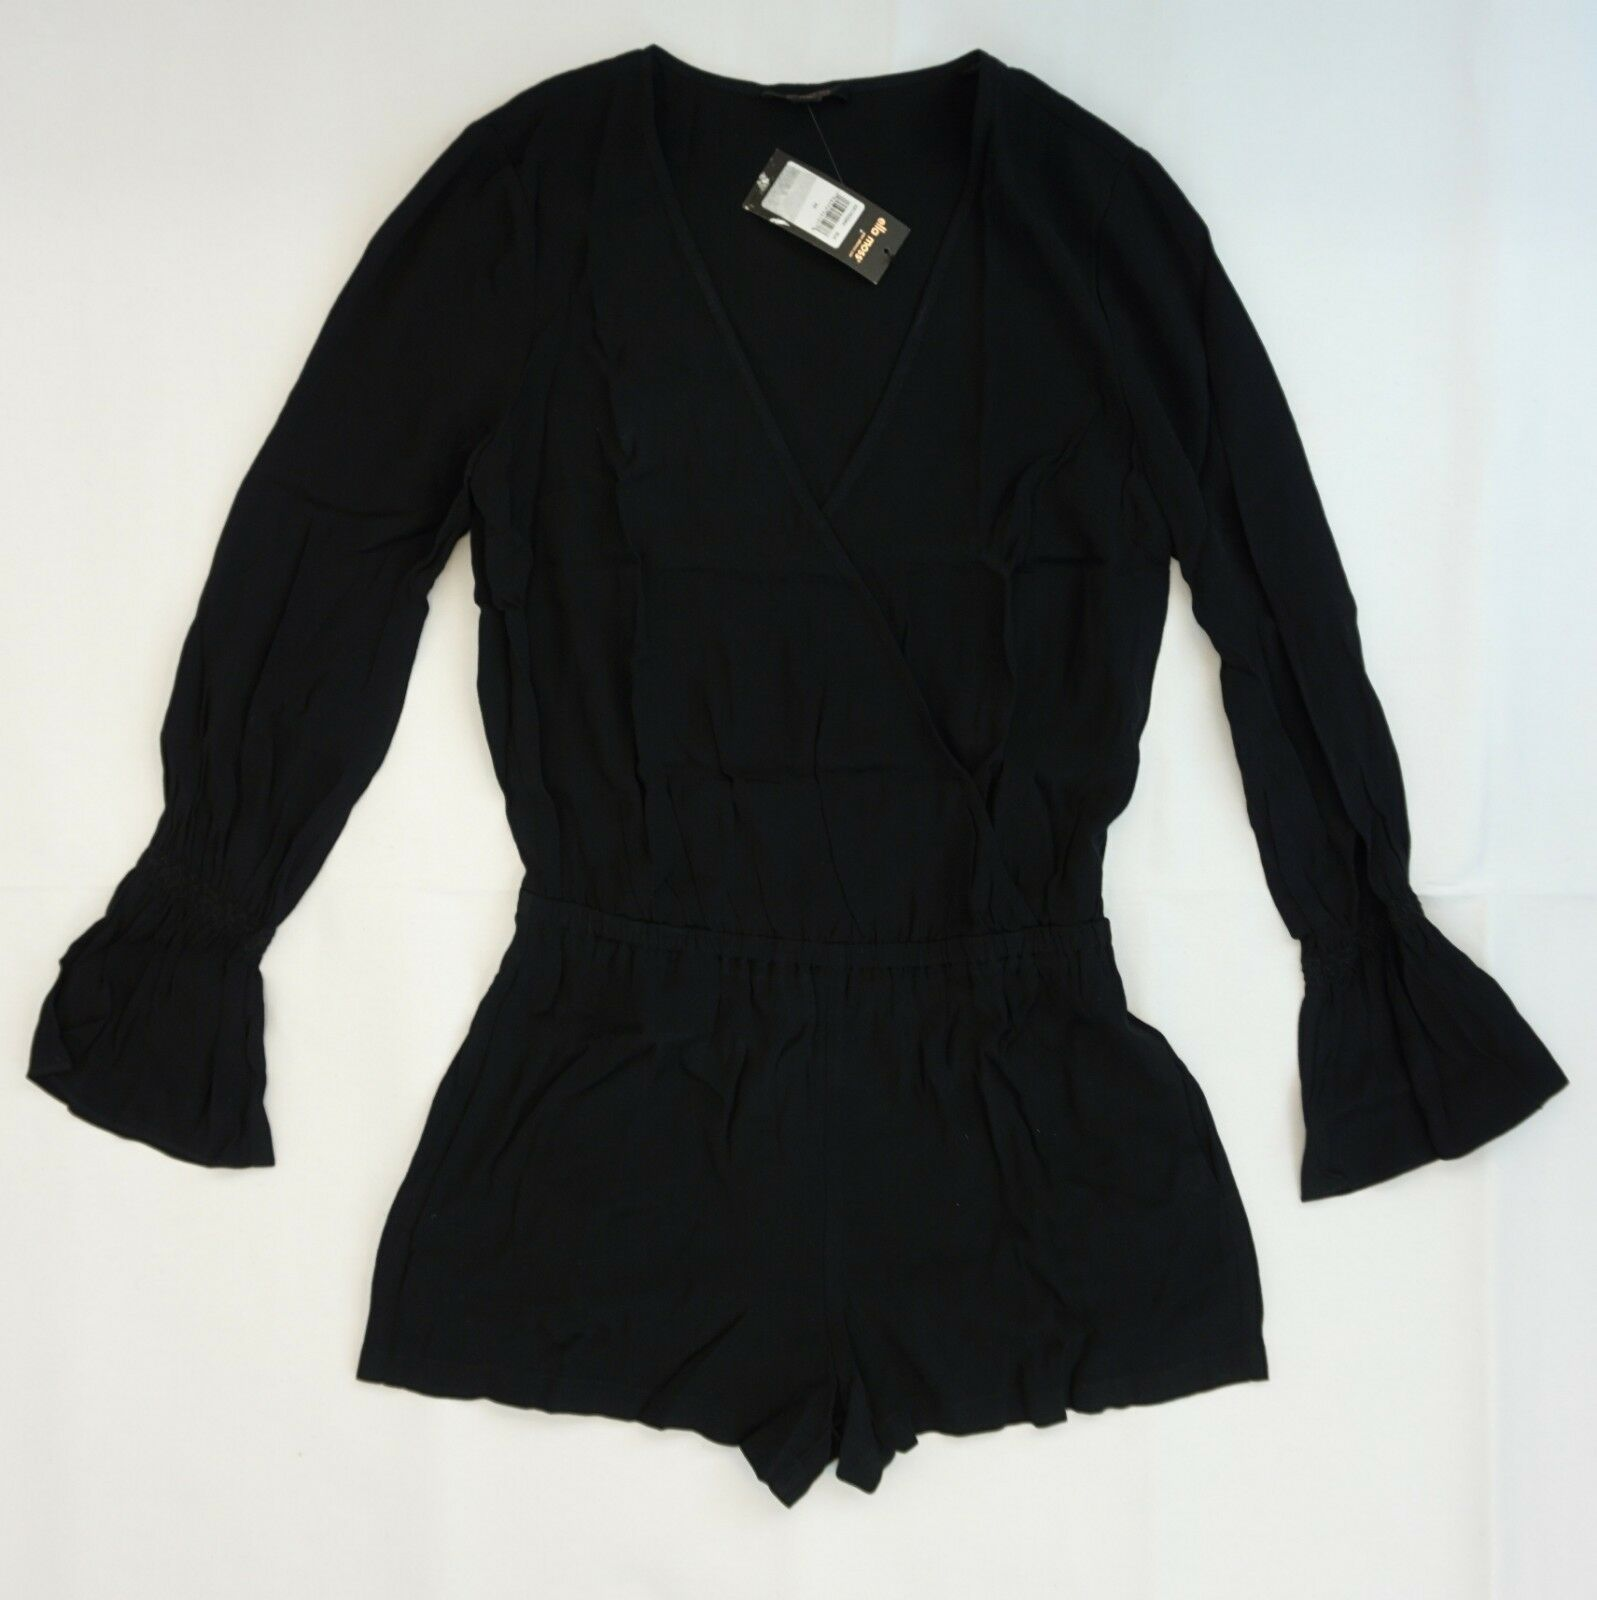 6d64d20a2c7 Ella Moss Womens Florica Romper XS Regular for sale online